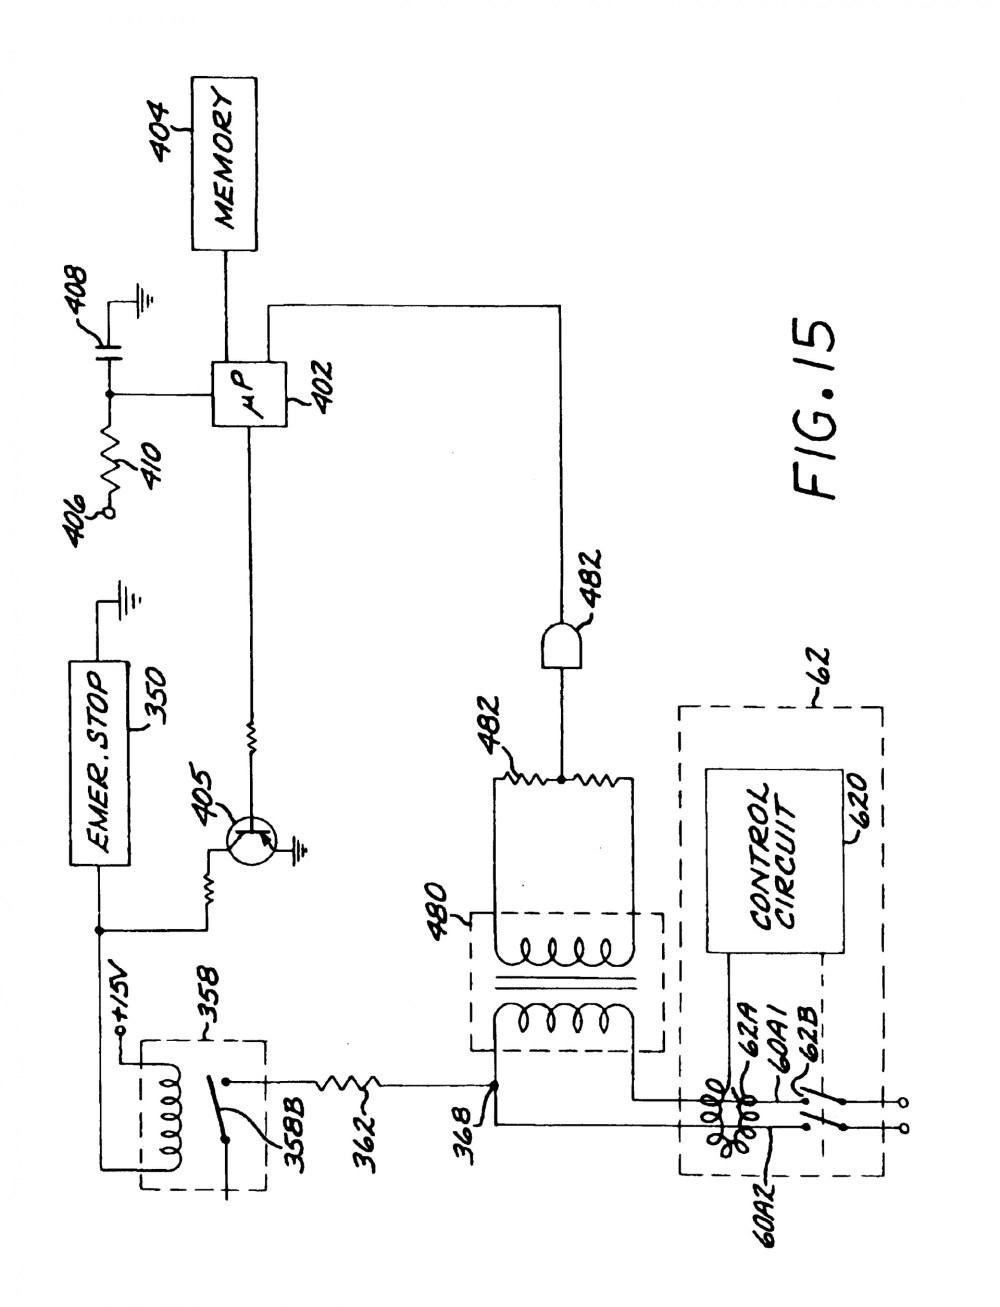 medium resolution of wiring pentair pool pump data schematic diagram pentair challenger pump wiring diagram pentair pump wiring diagram